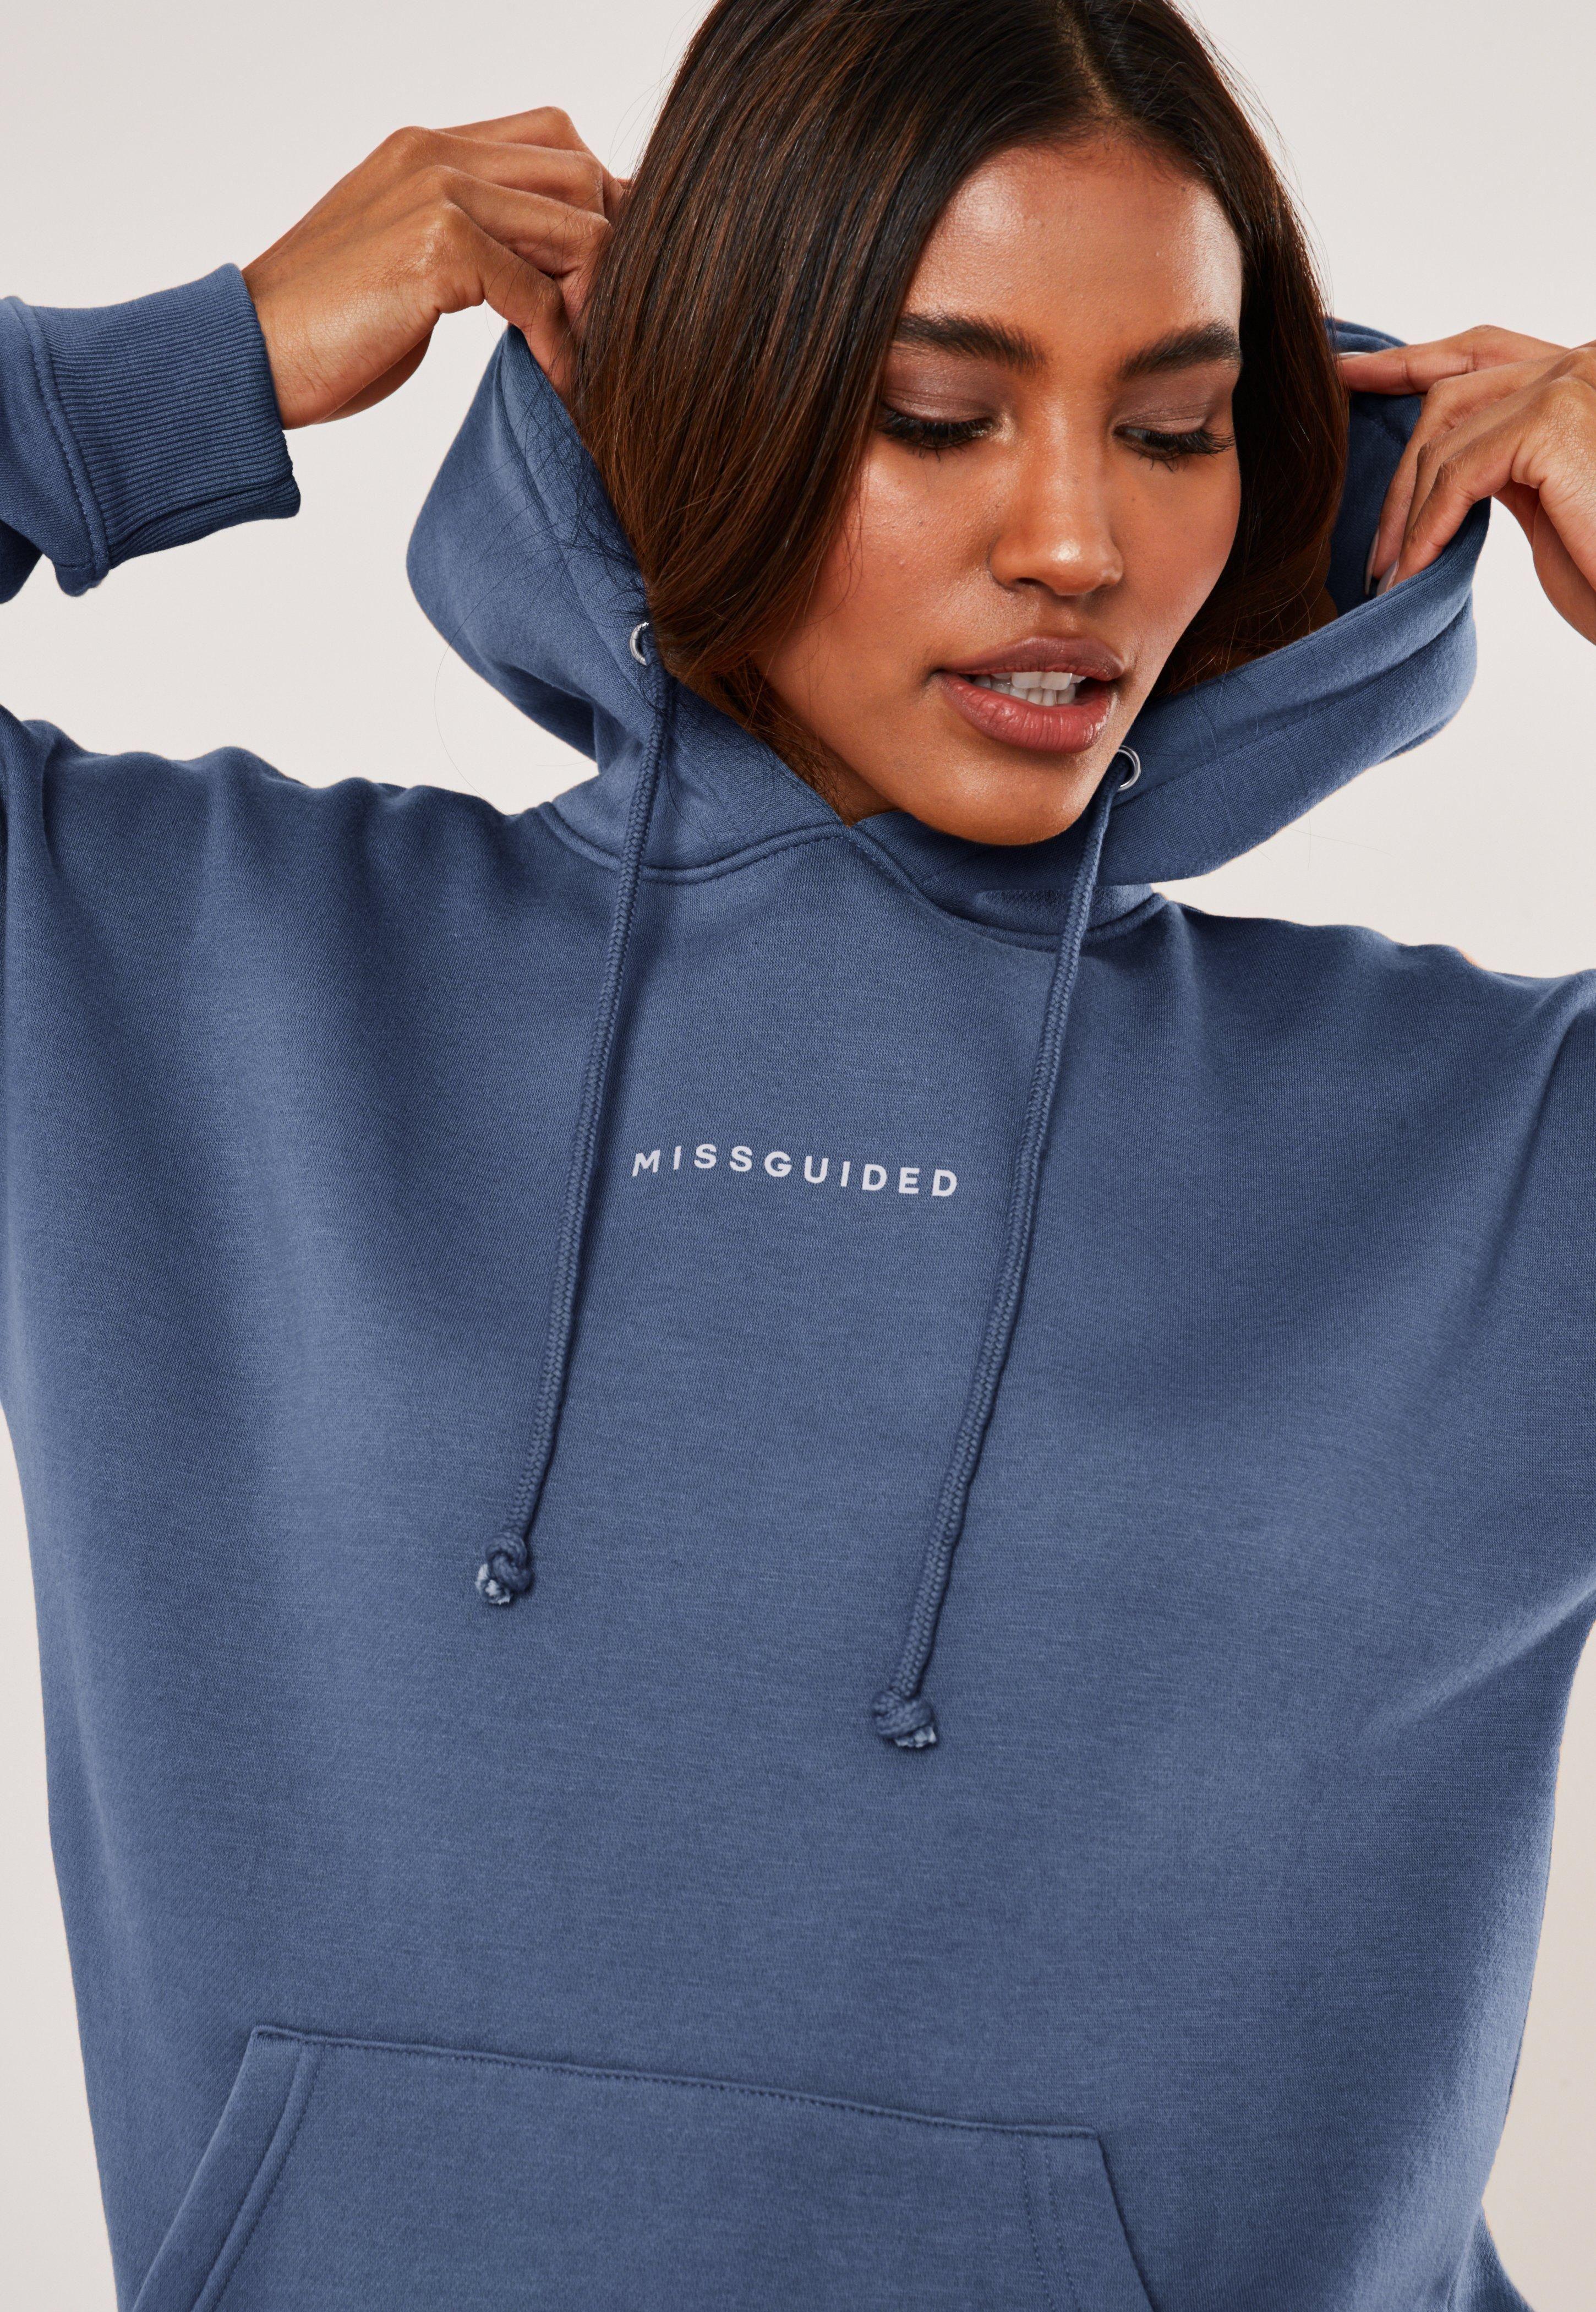 Navy Missguided Basic Hoodie Sponsored Missguided Paid Navy Hoodie Basic Hoodie Hoodies Missguided [ 4200 x 2900 Pixel ]